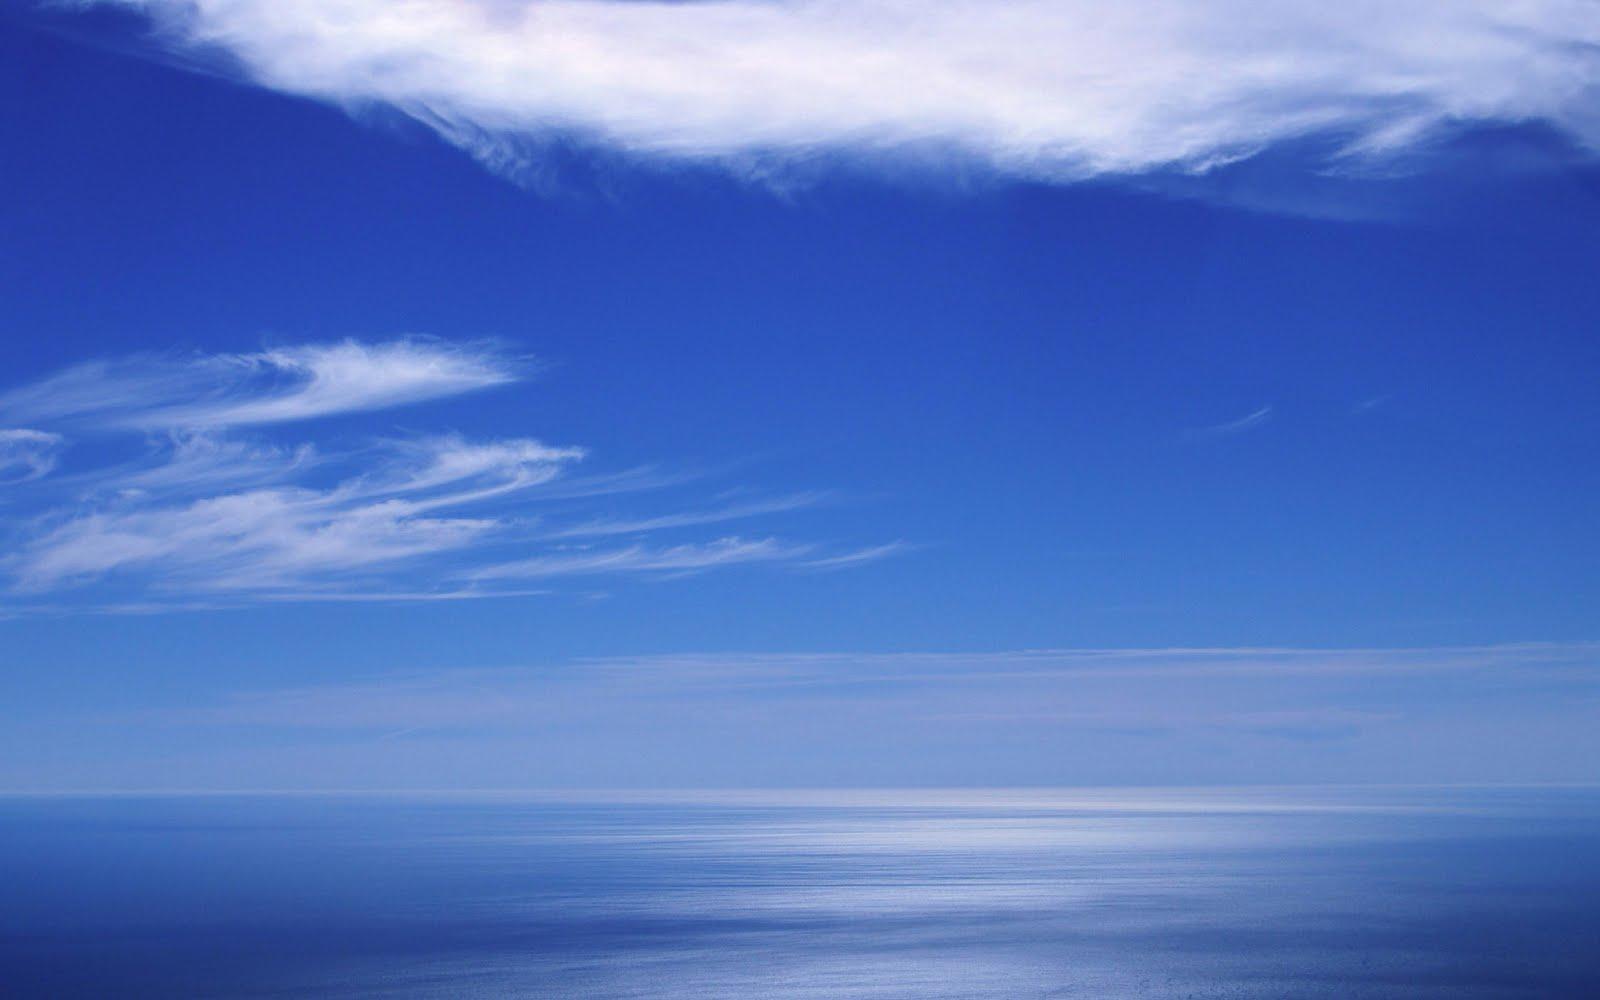 Flat Earth Image Proofs   Ws_Blue_sea_horizon_2560x1600